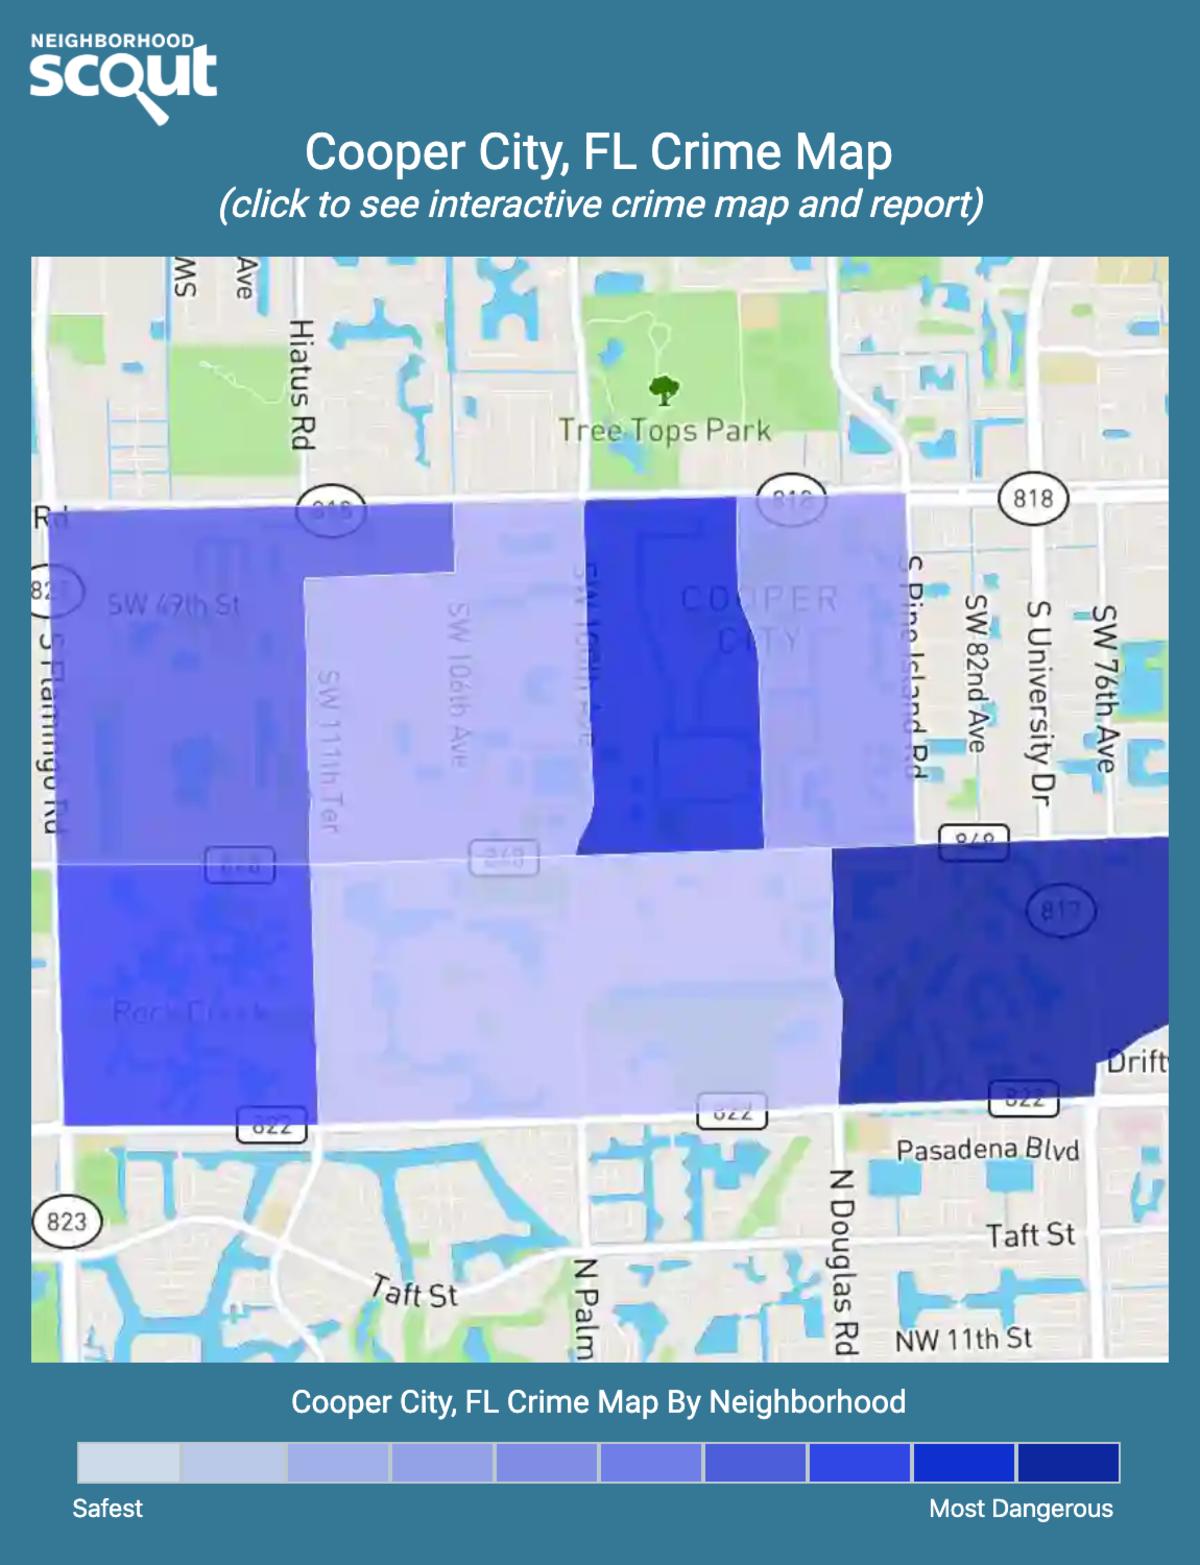 Cooper City, Florida crime map